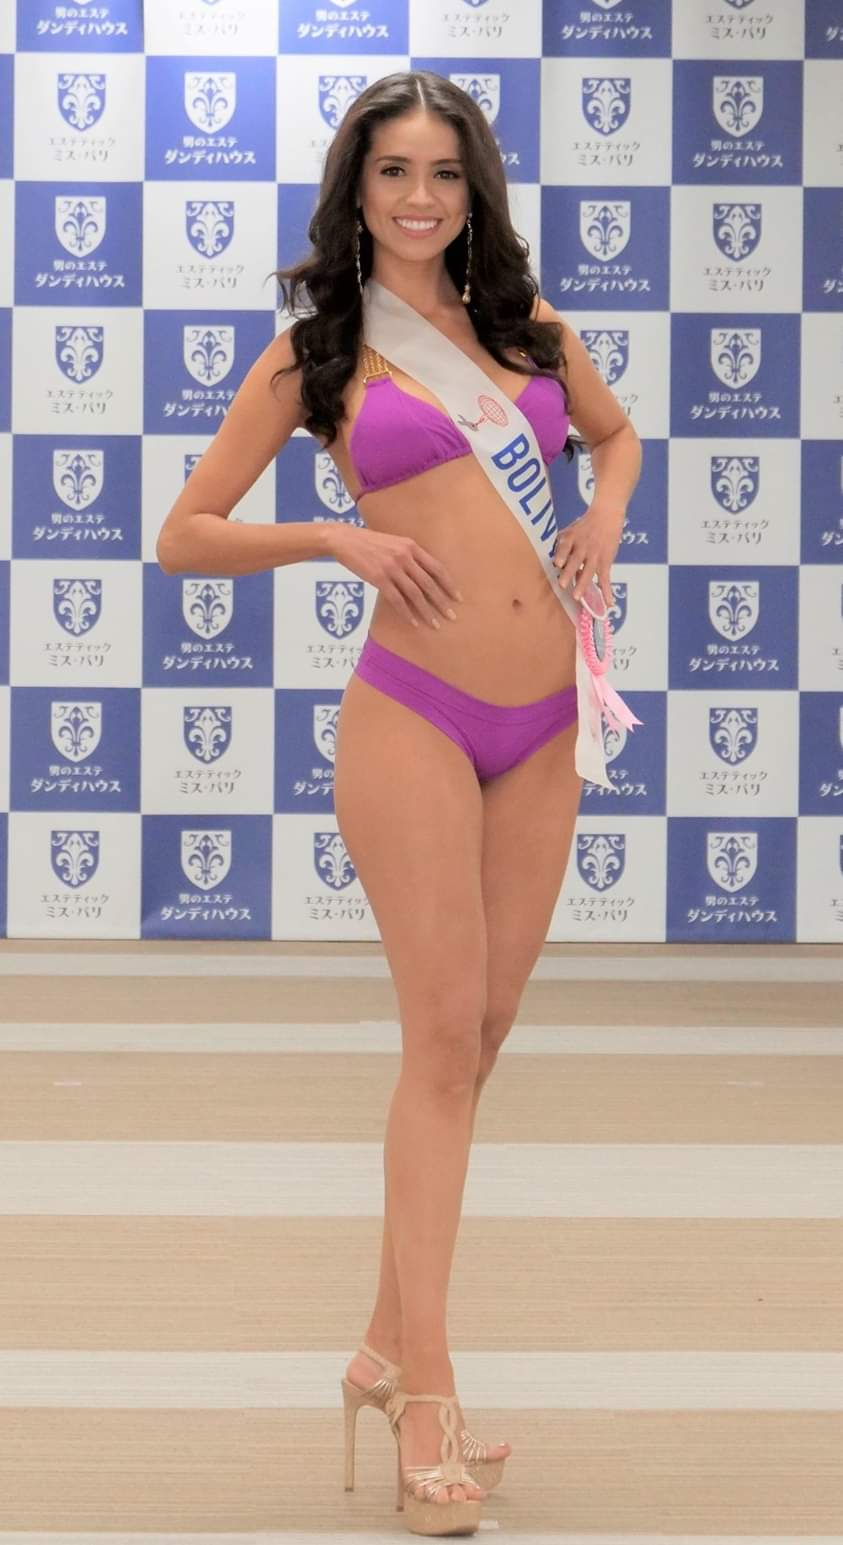 Round 50th : Miss International 2018 Bolivi12